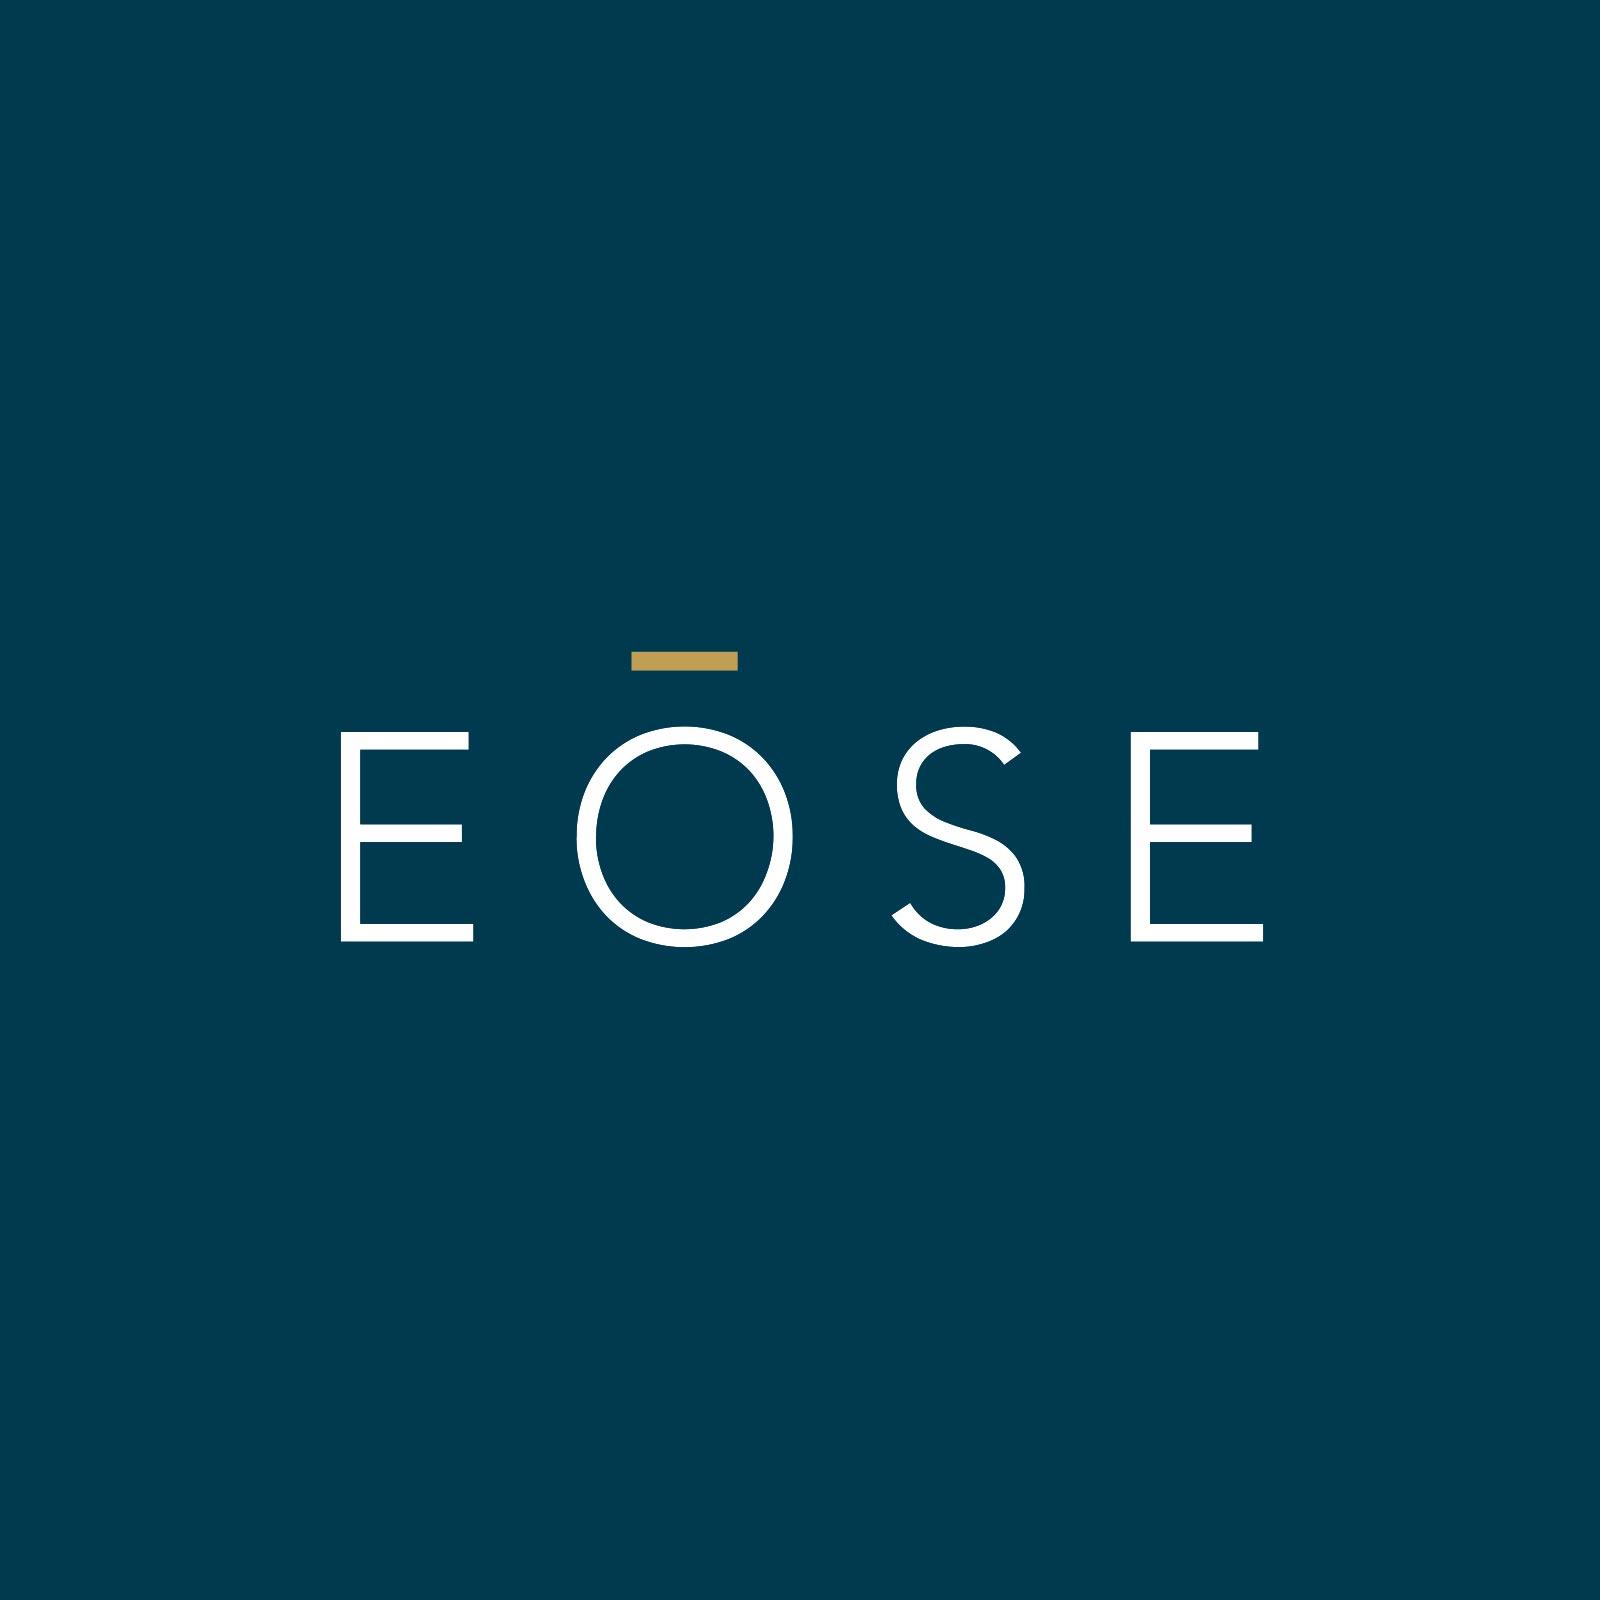 EOSE_LOGO.jpg